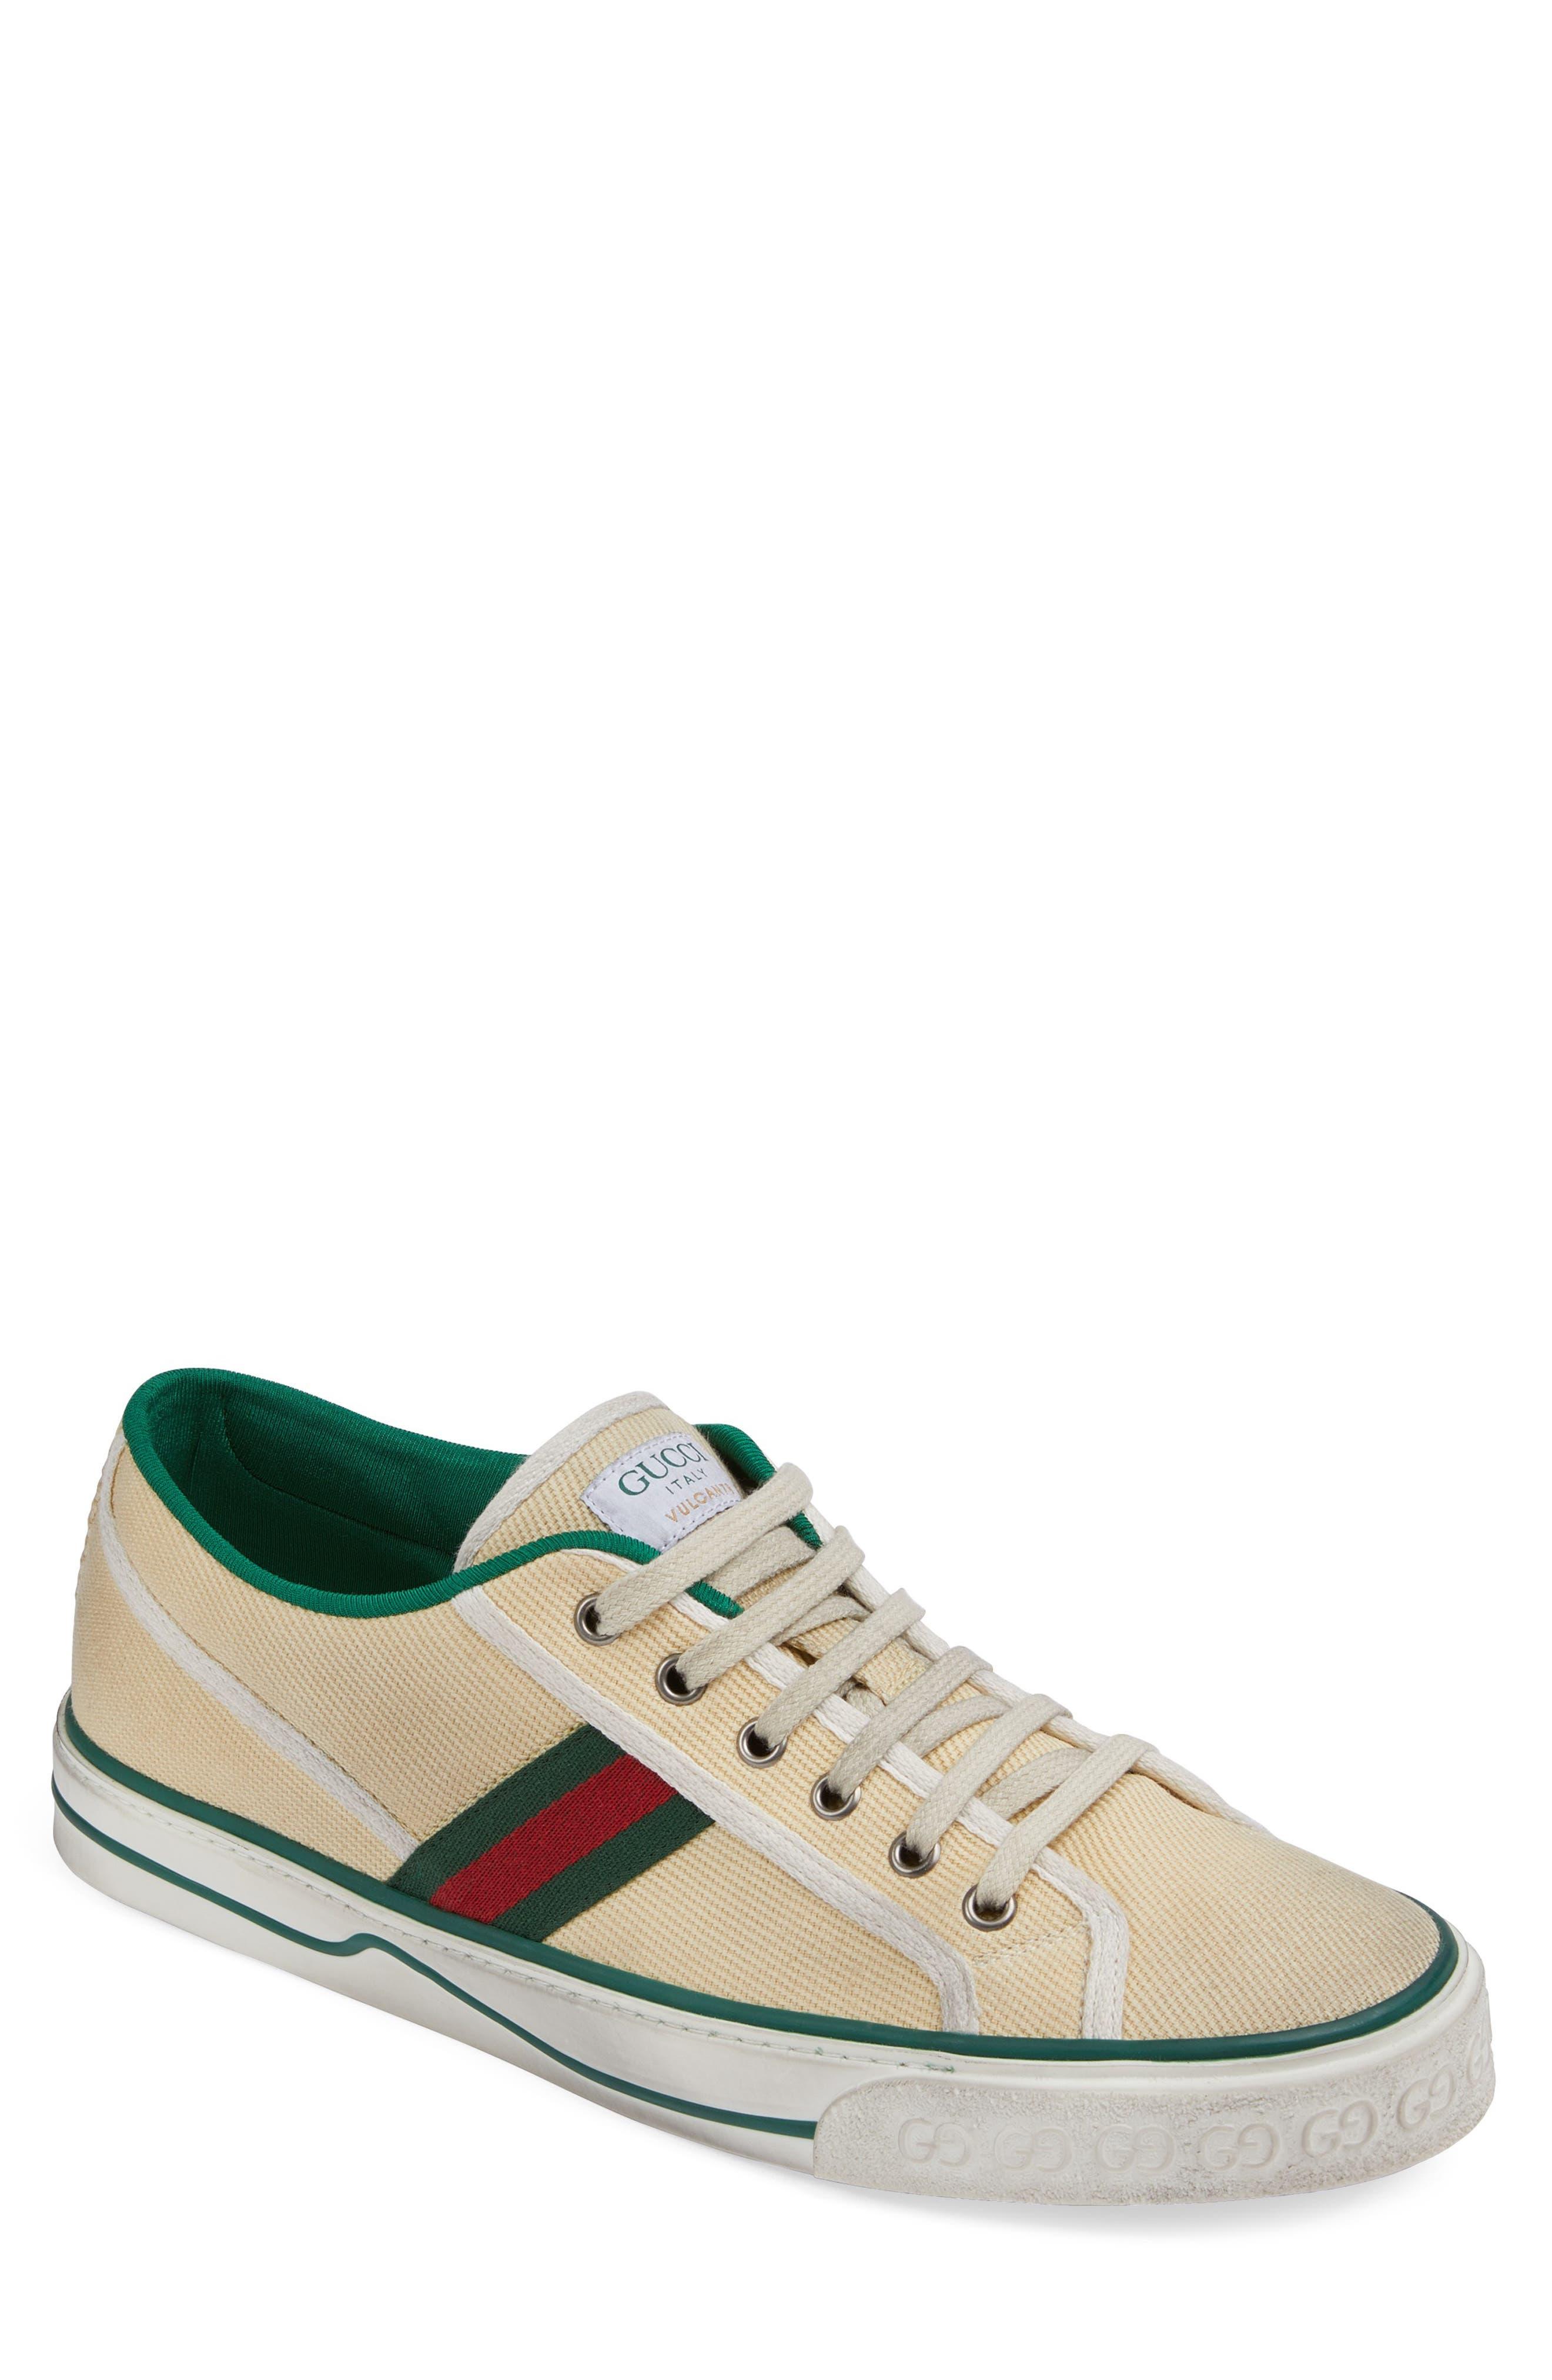 Gucci Web Canvas Low Top Sneaker (Men